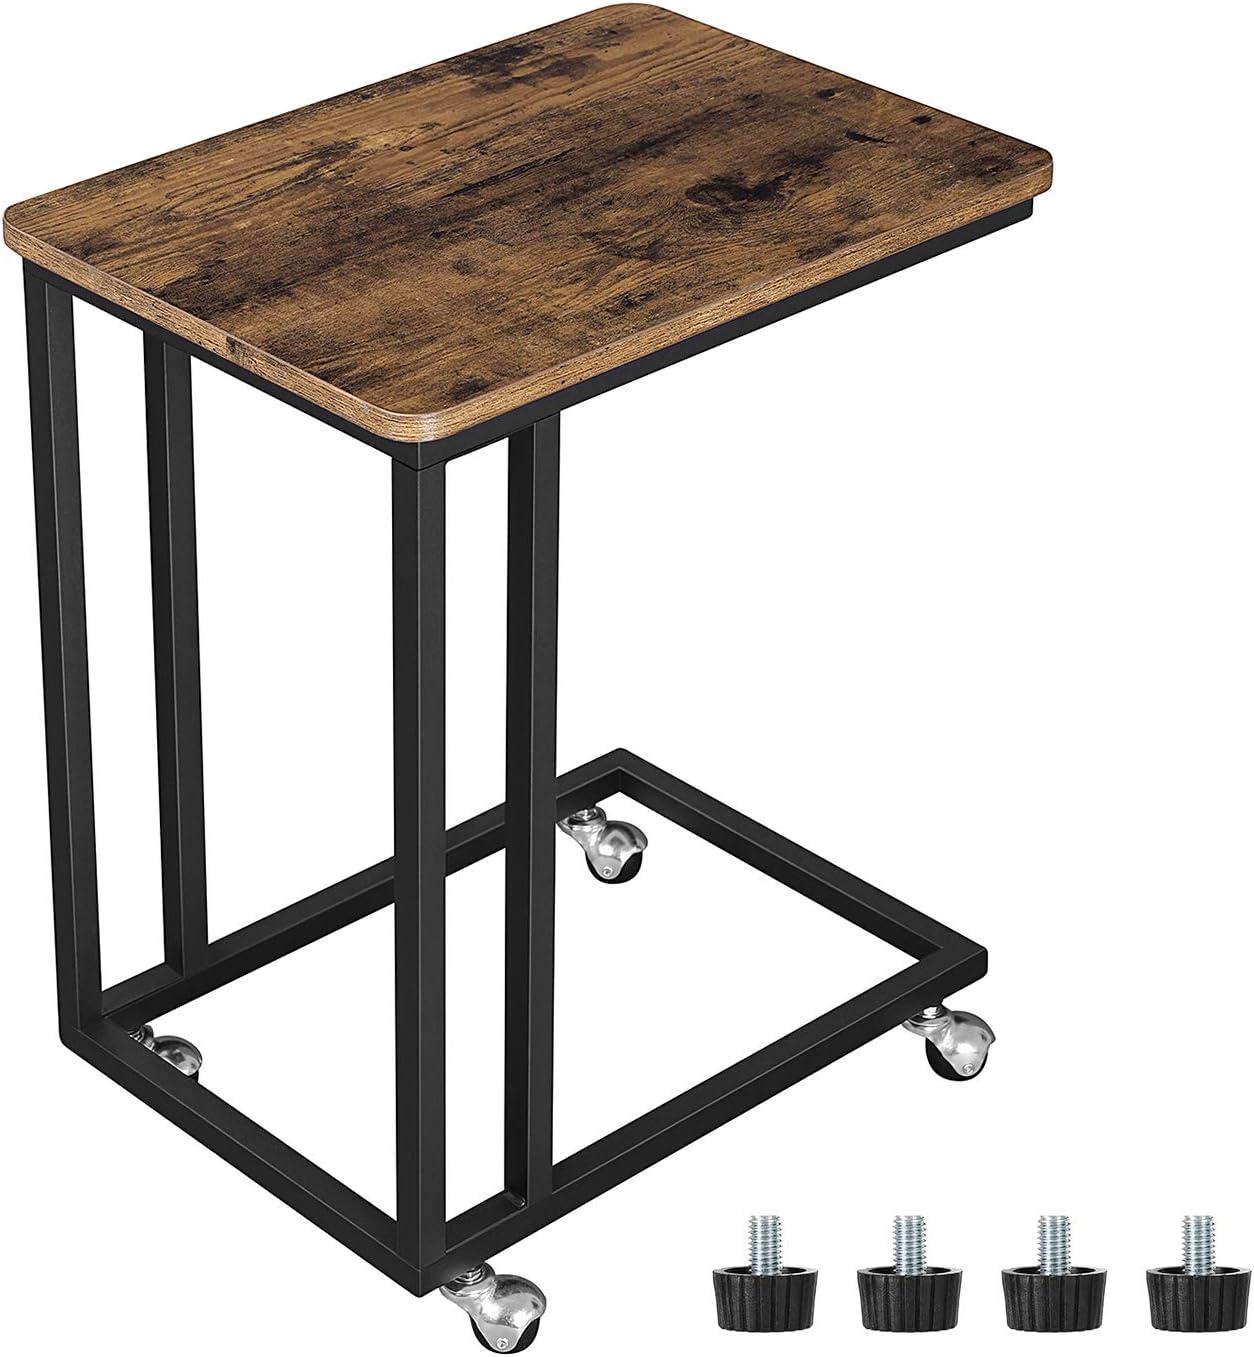 VASAGLE Mesa Auxiliar con Ruedas para sofá Mesa Lateral Café Comidas Ordenador iPad Estructura de Metal Estilo Retro LNT50X